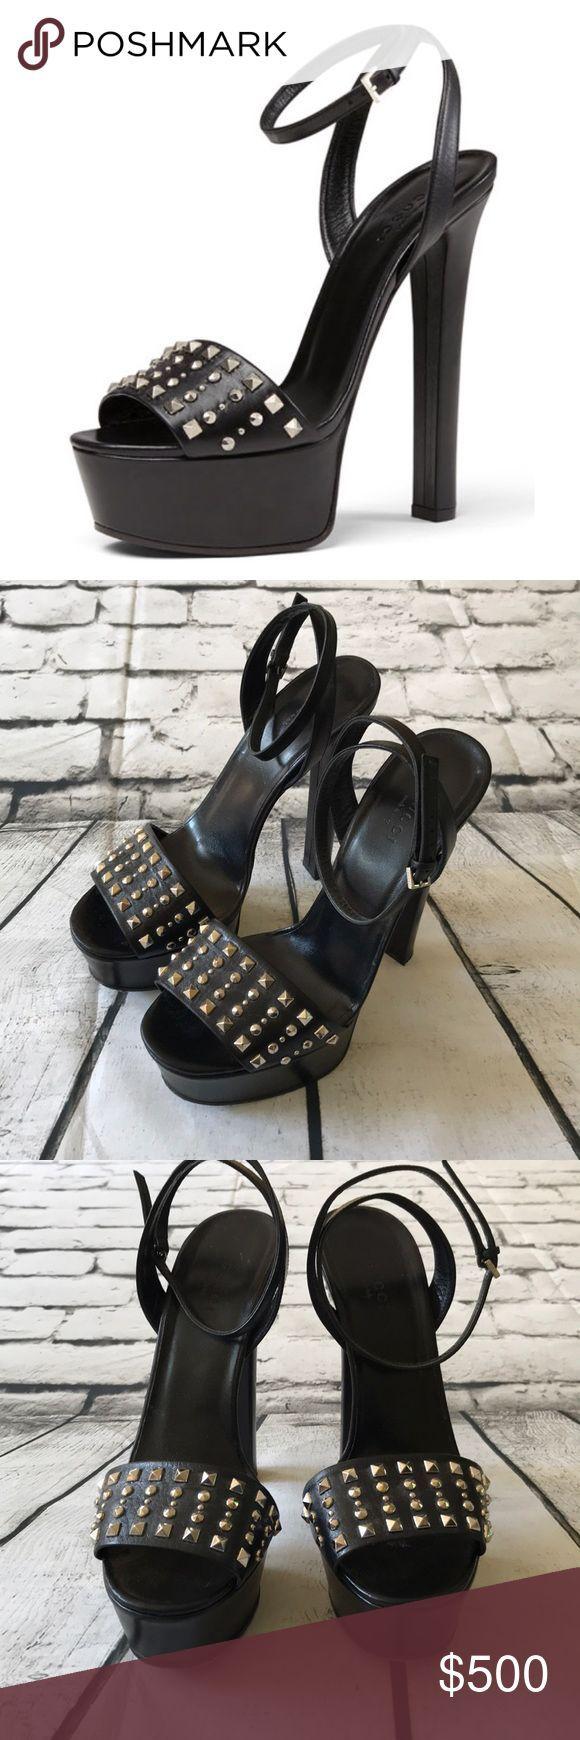 Gucci Leila Plateausandale mit Nieten Schwarze Sandalen Gucci Ledersandale mit   My Posh Picks